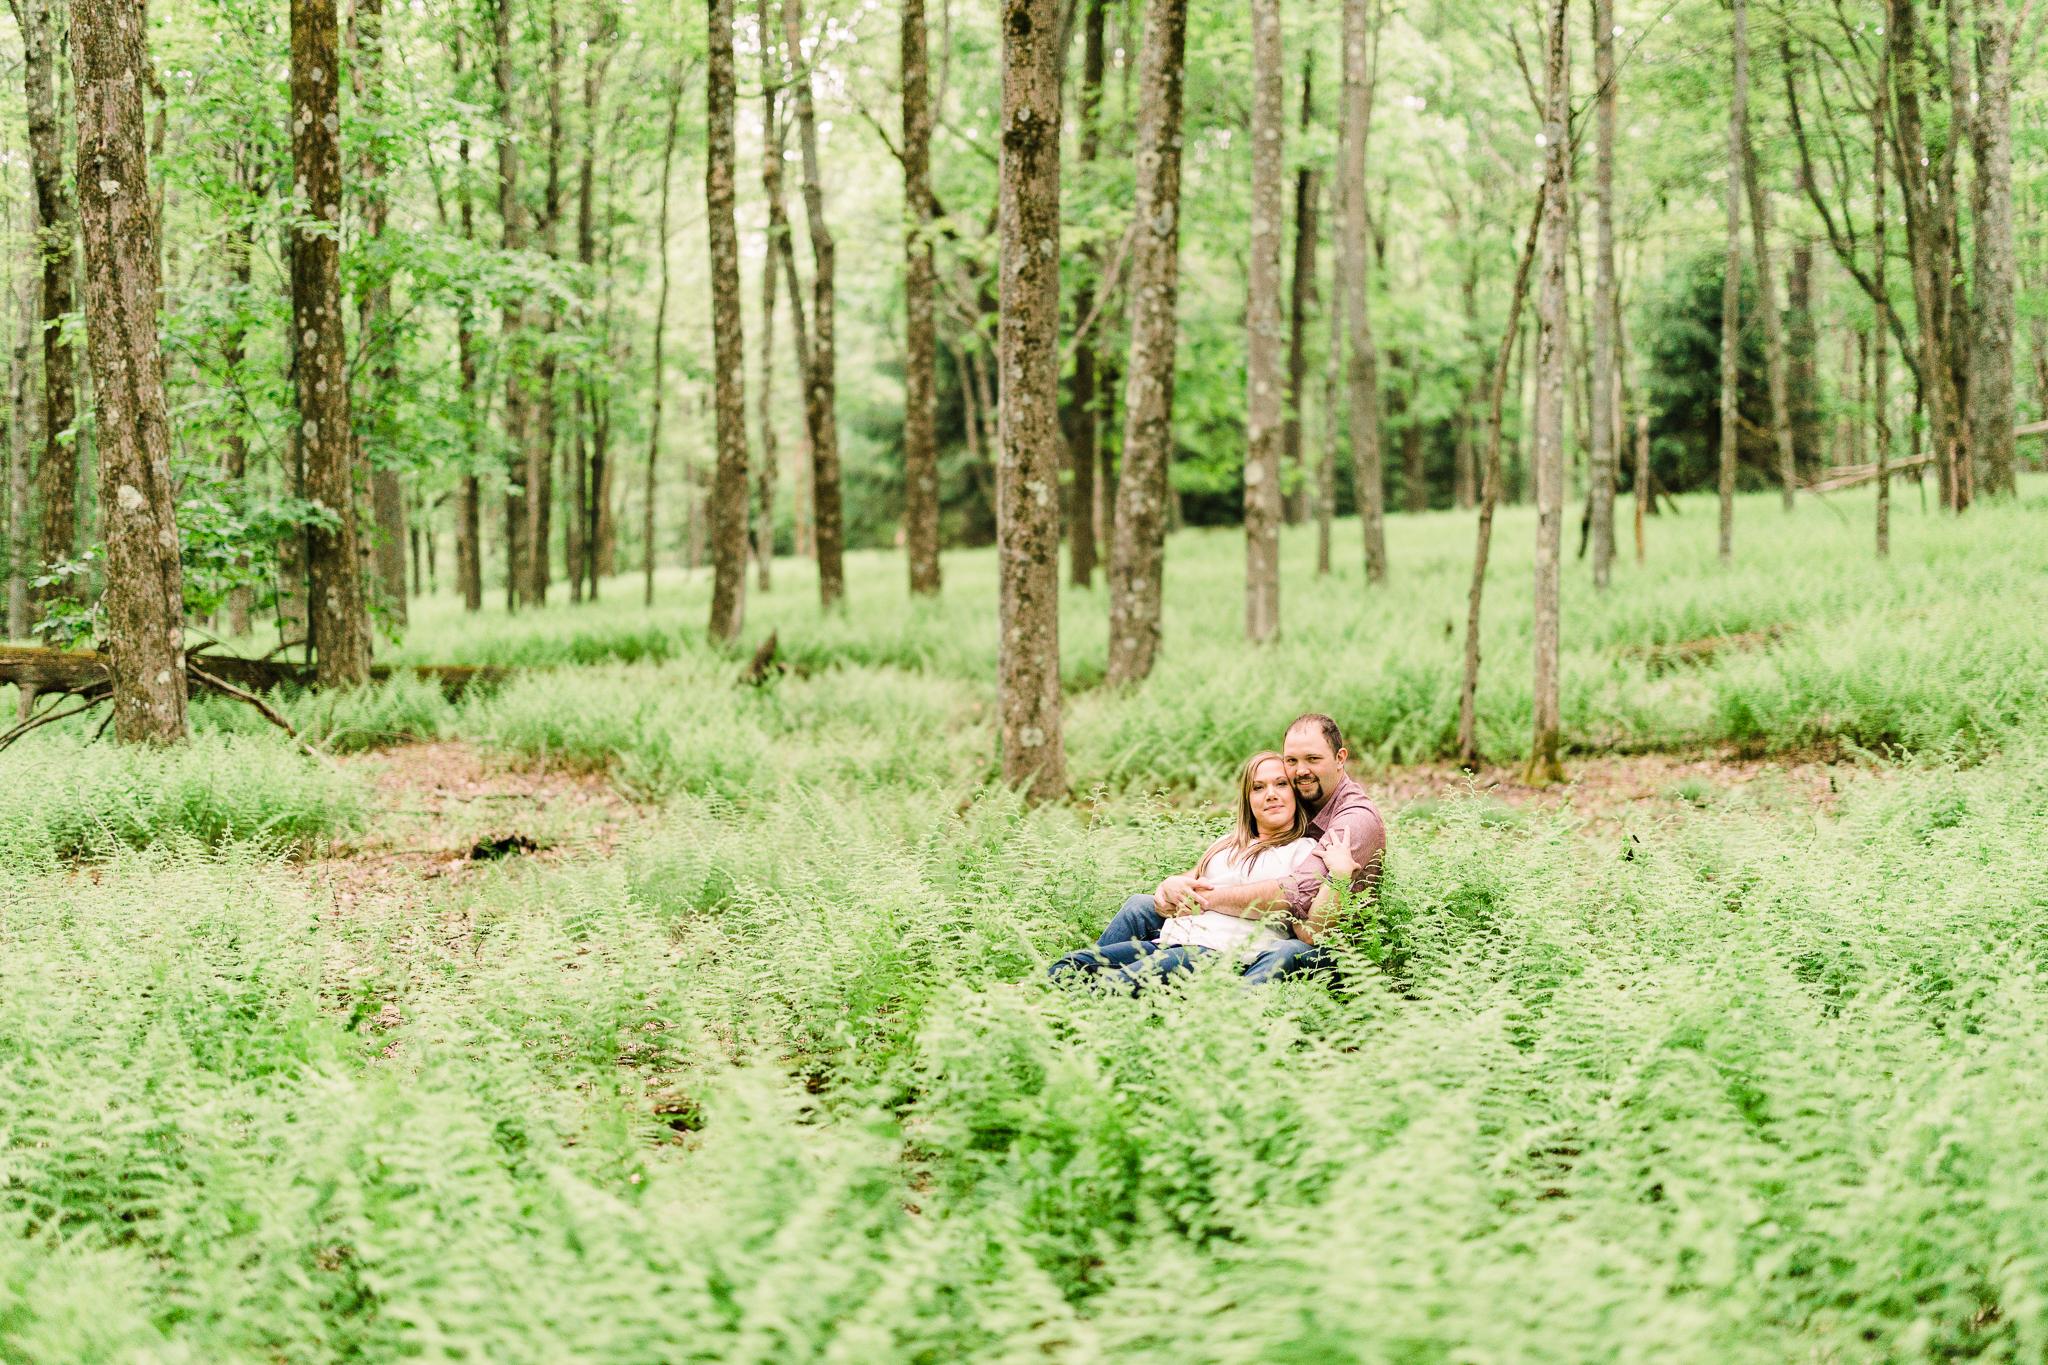 Kettle-creek-state-park-engagement-9309.jpg